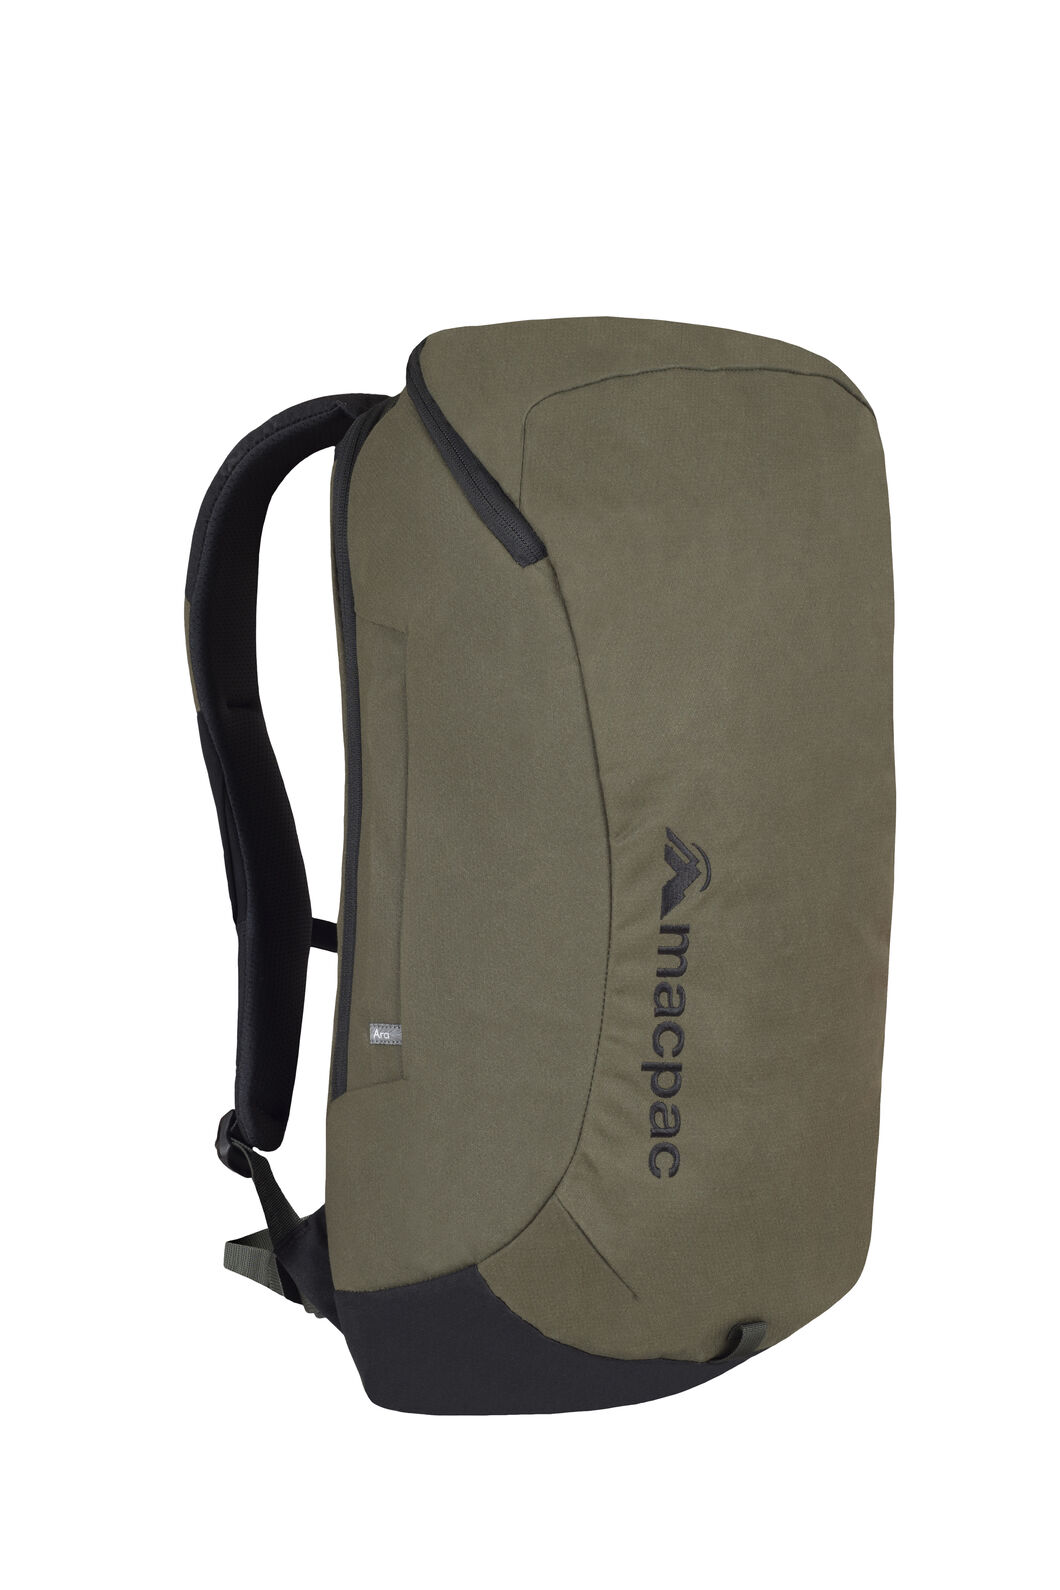 Macpac Ara 25L AzTec® Backpack, Forest Night, hi-res